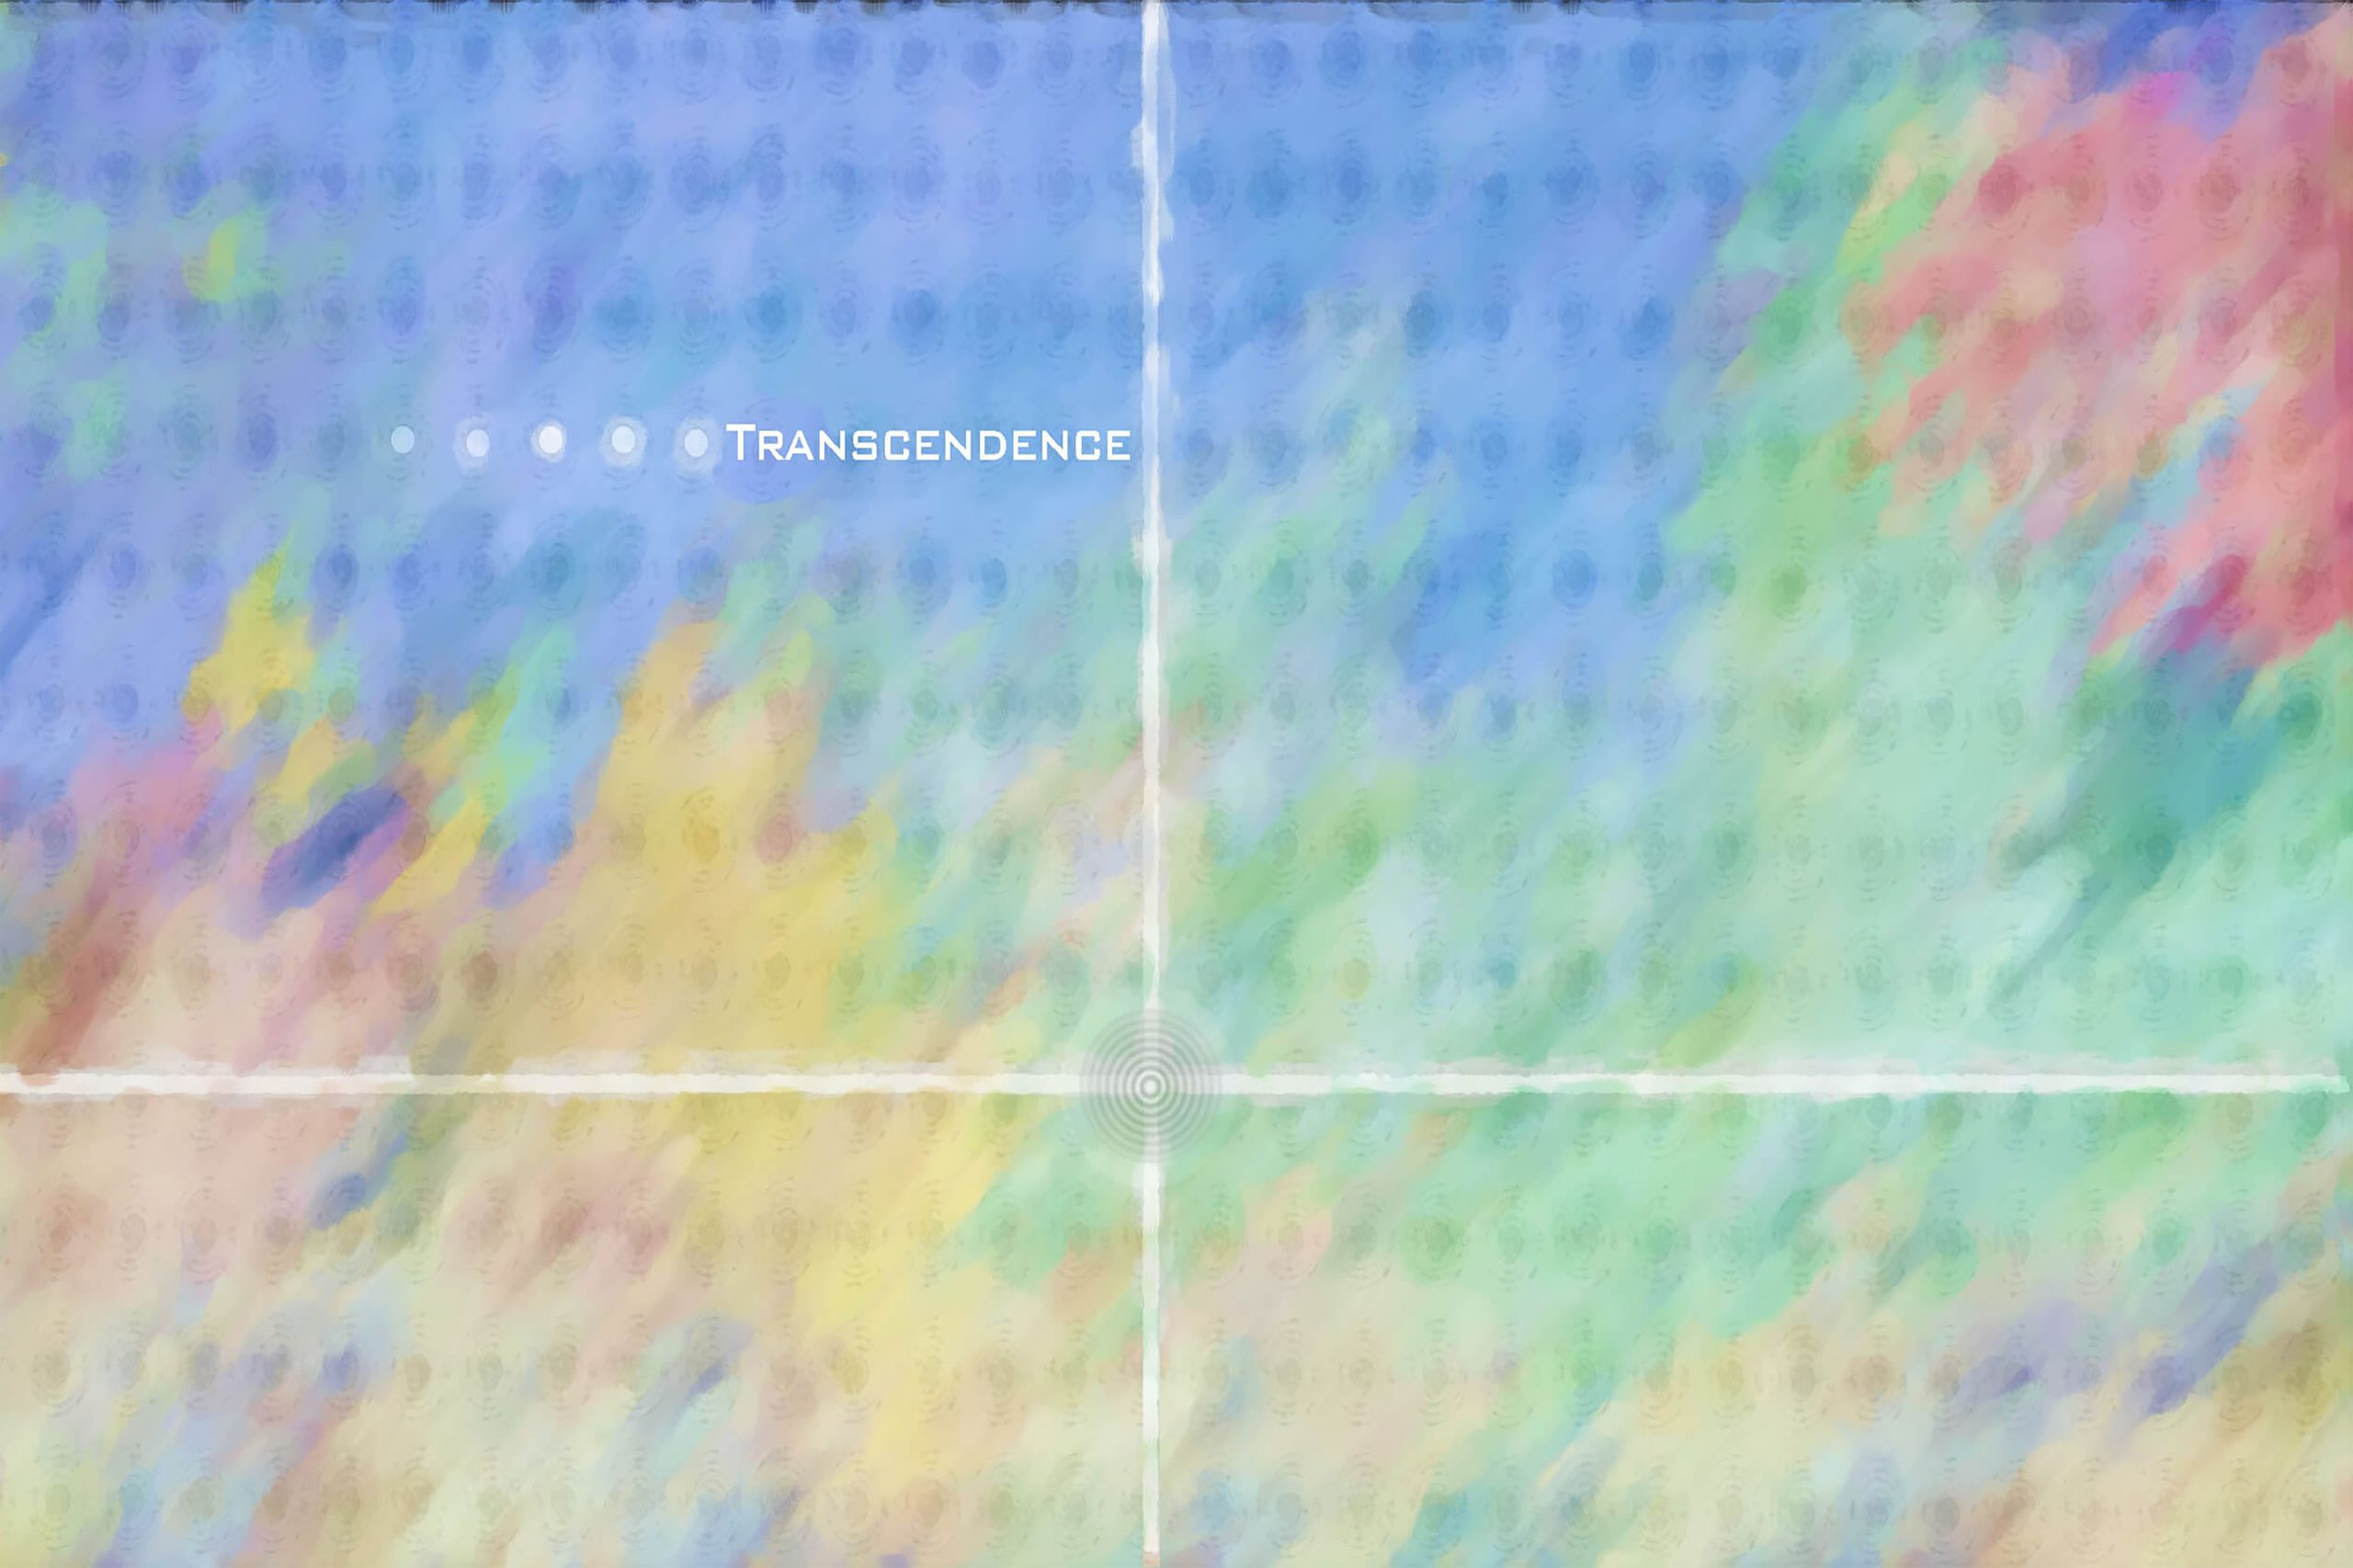 Transcendence - James Martinez